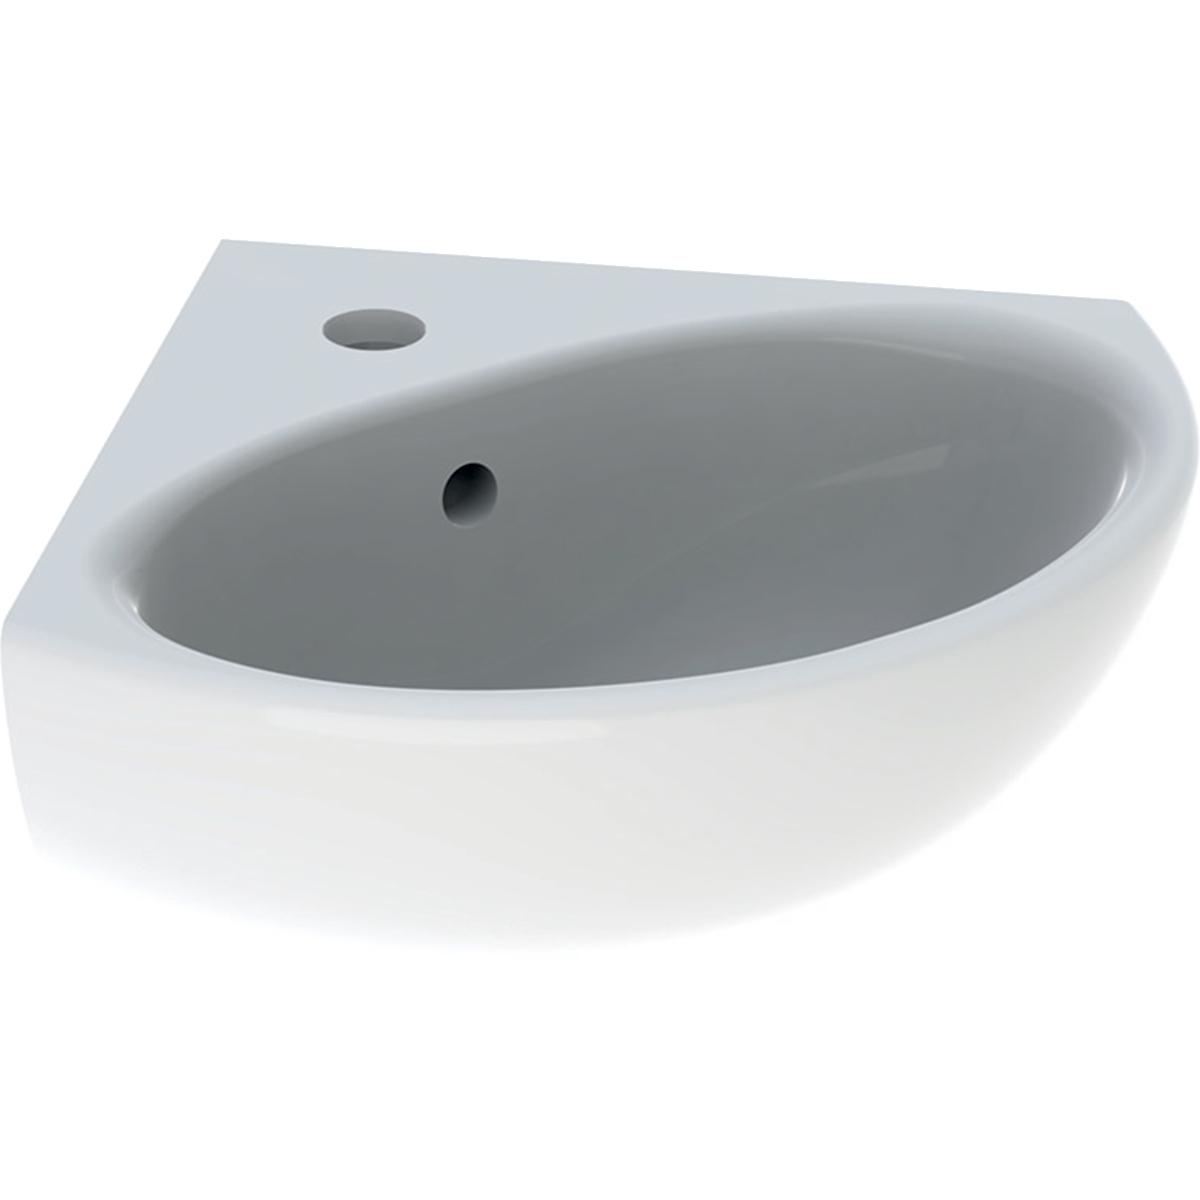 Lave-mains d'angle Bastia Geberit